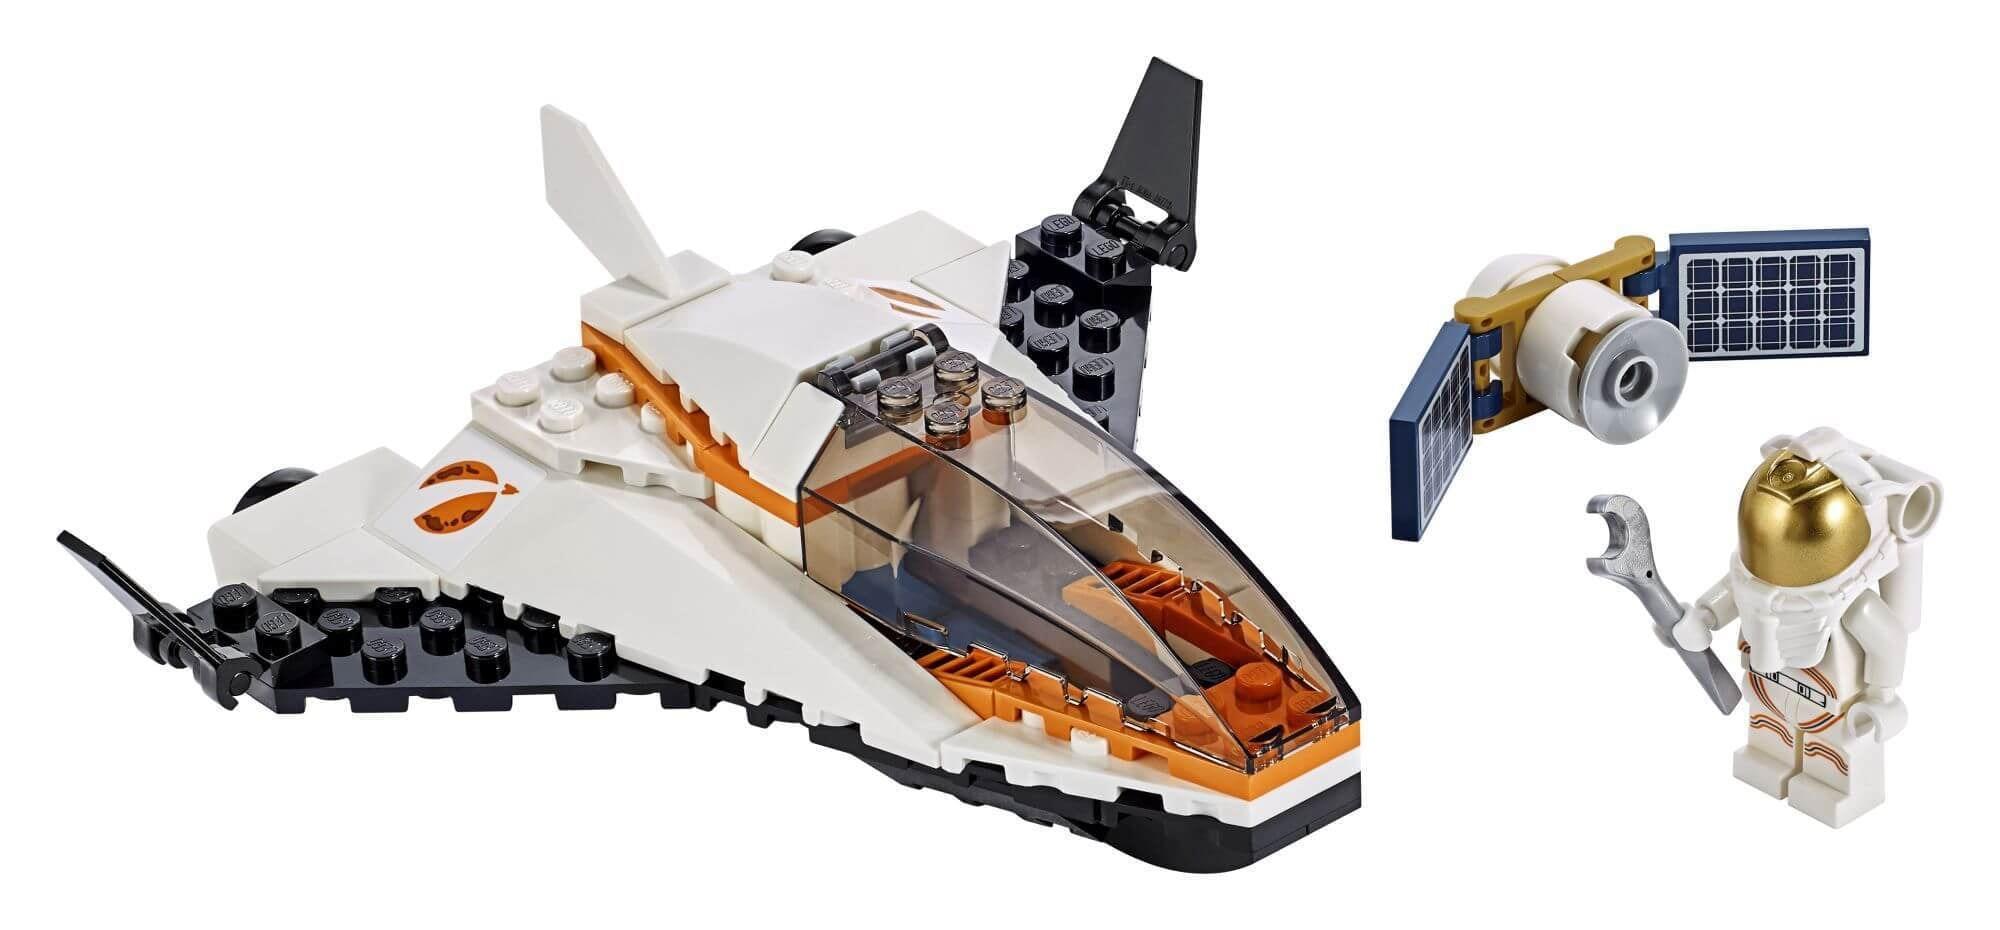 Lego 60224 City Space Satellite Service Mission